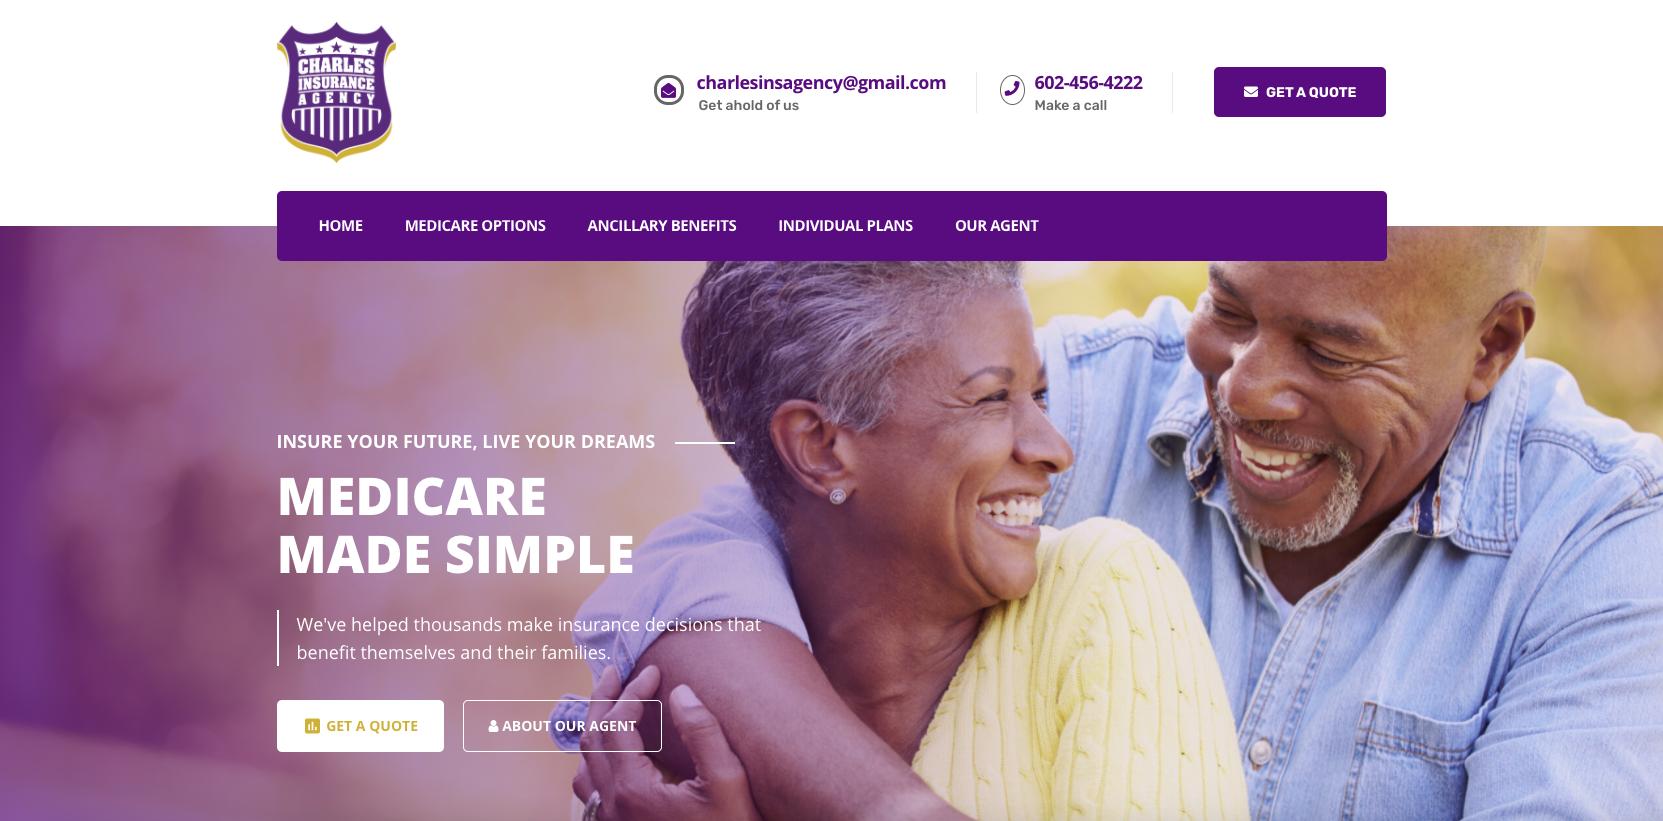 Charles Insurance Agency Blossom Digital Marketing Website Design